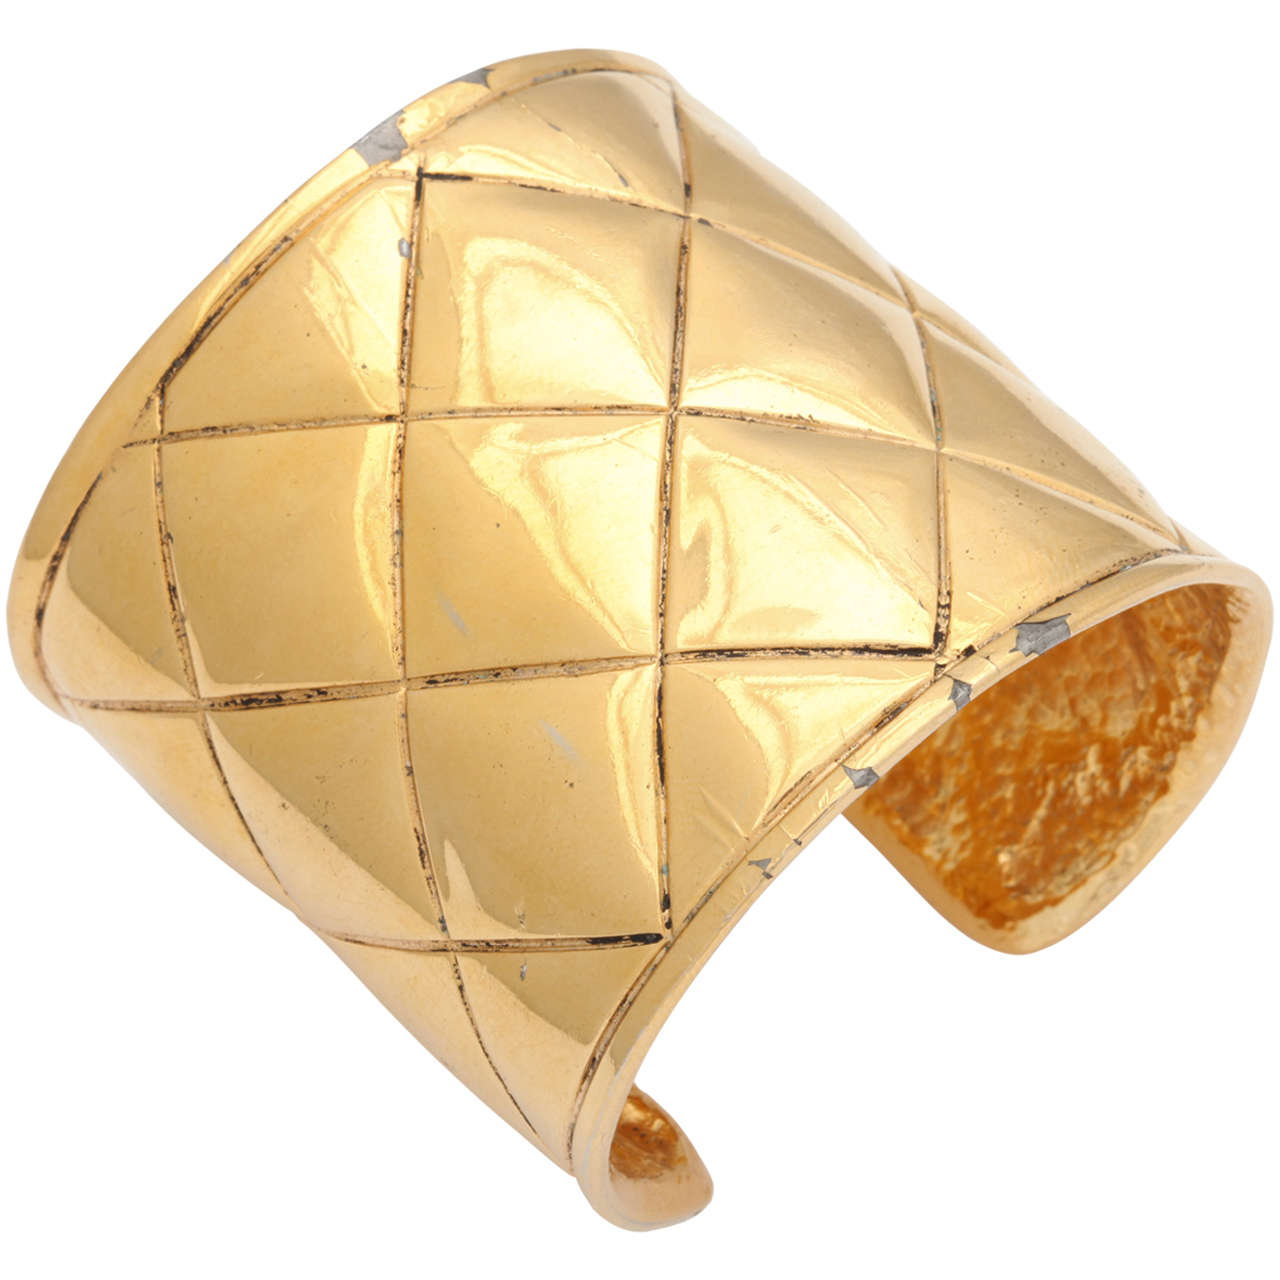 Chanel Quilted Bangle Bracelet 1